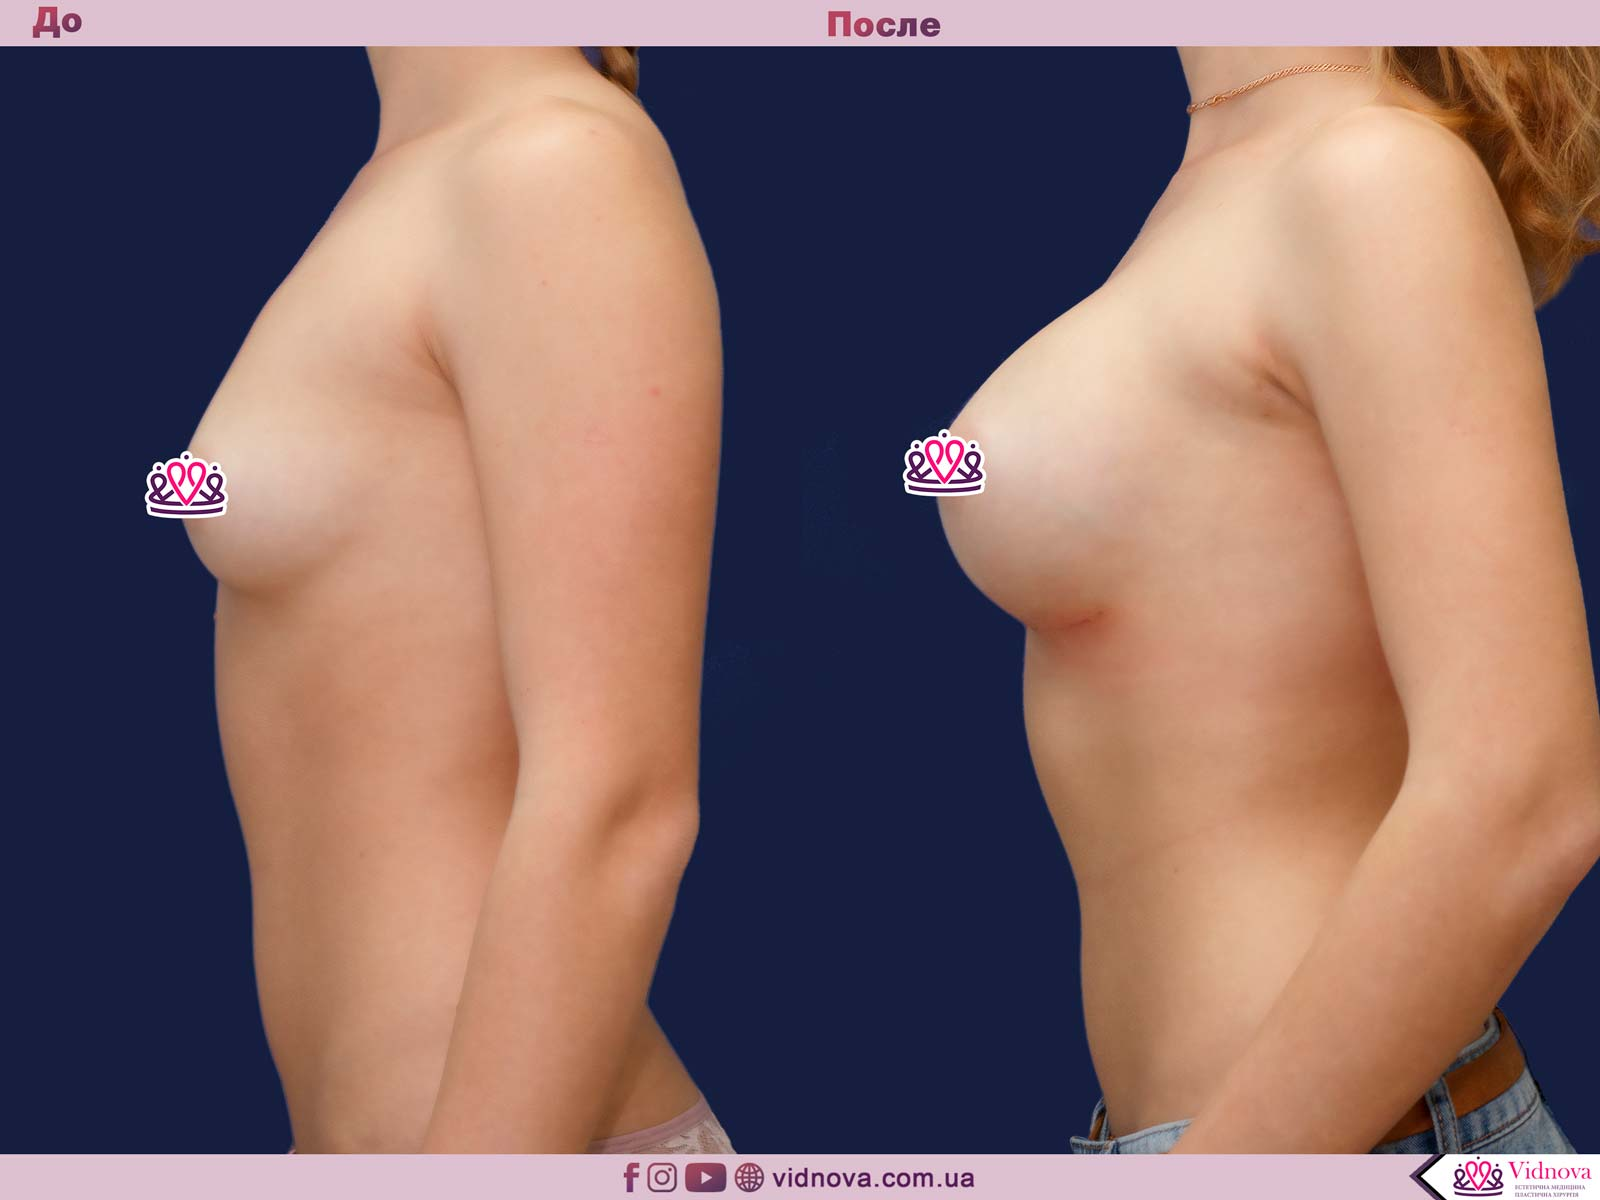 Увеличение груди: Фото ДО и ПОСЛЕ - Пример №60-3 - Клиника Vidnova